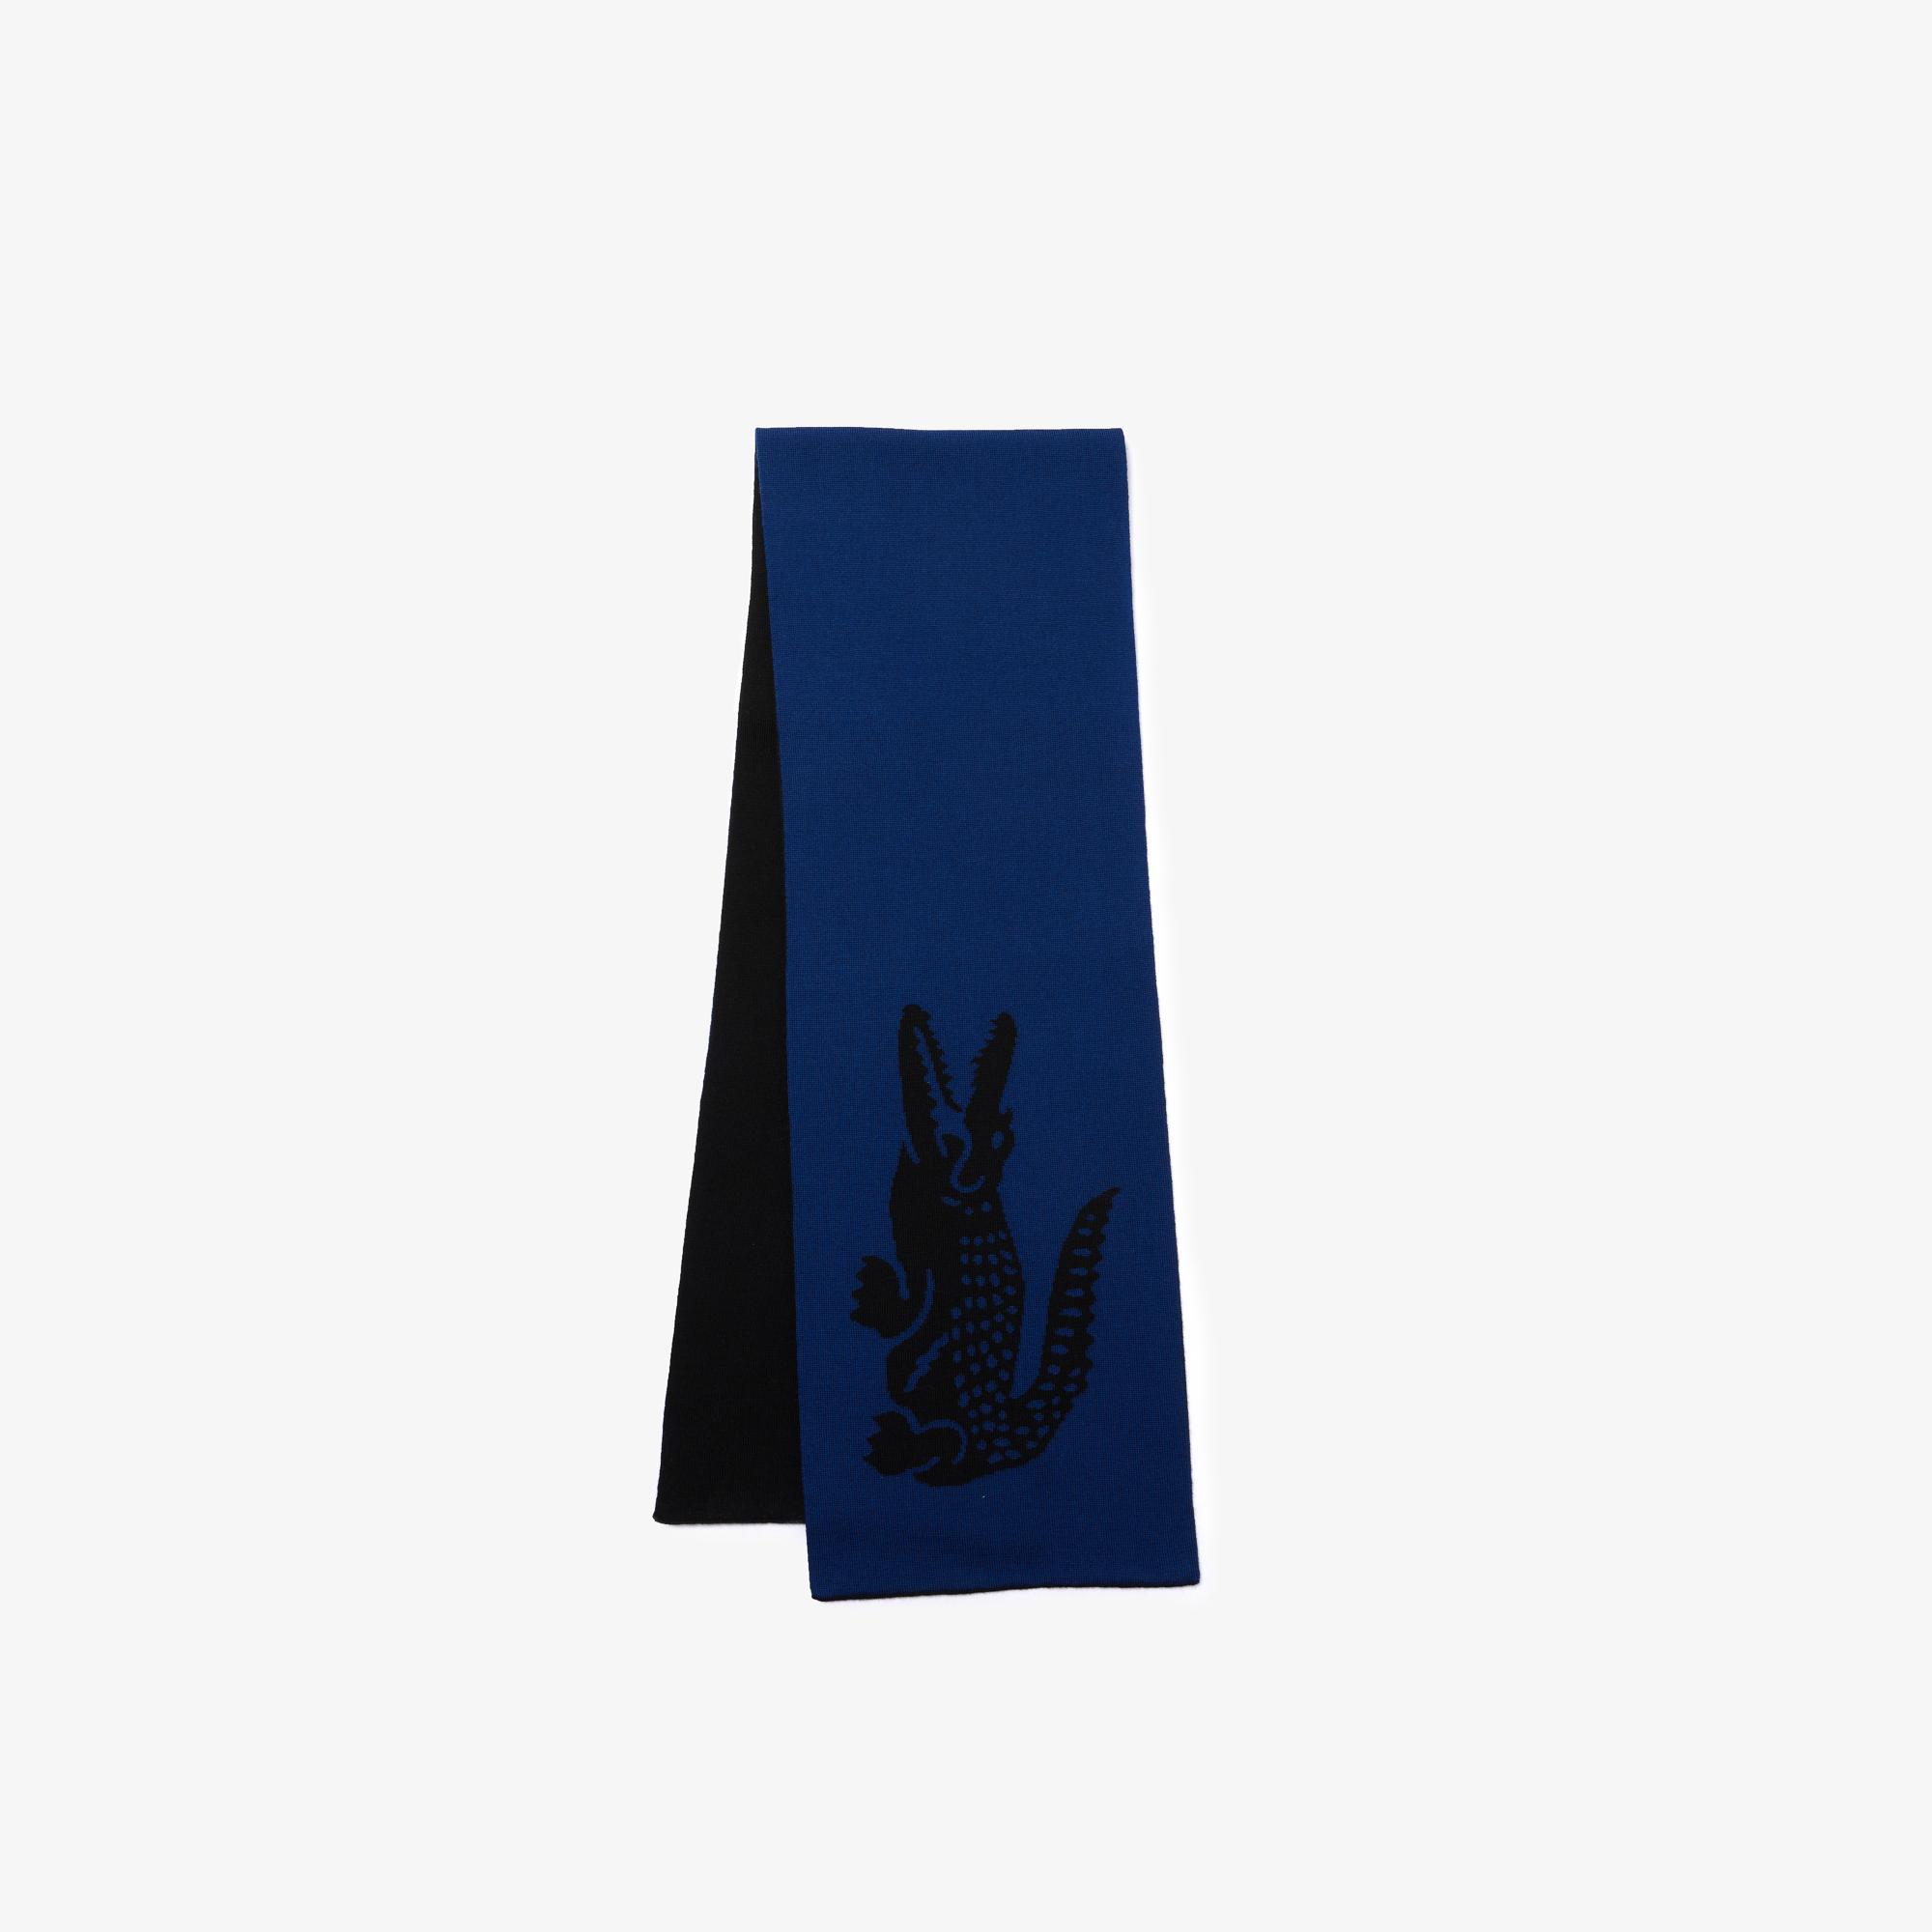 Lacoste Unisex Yün Siyah - Mavi Atkı